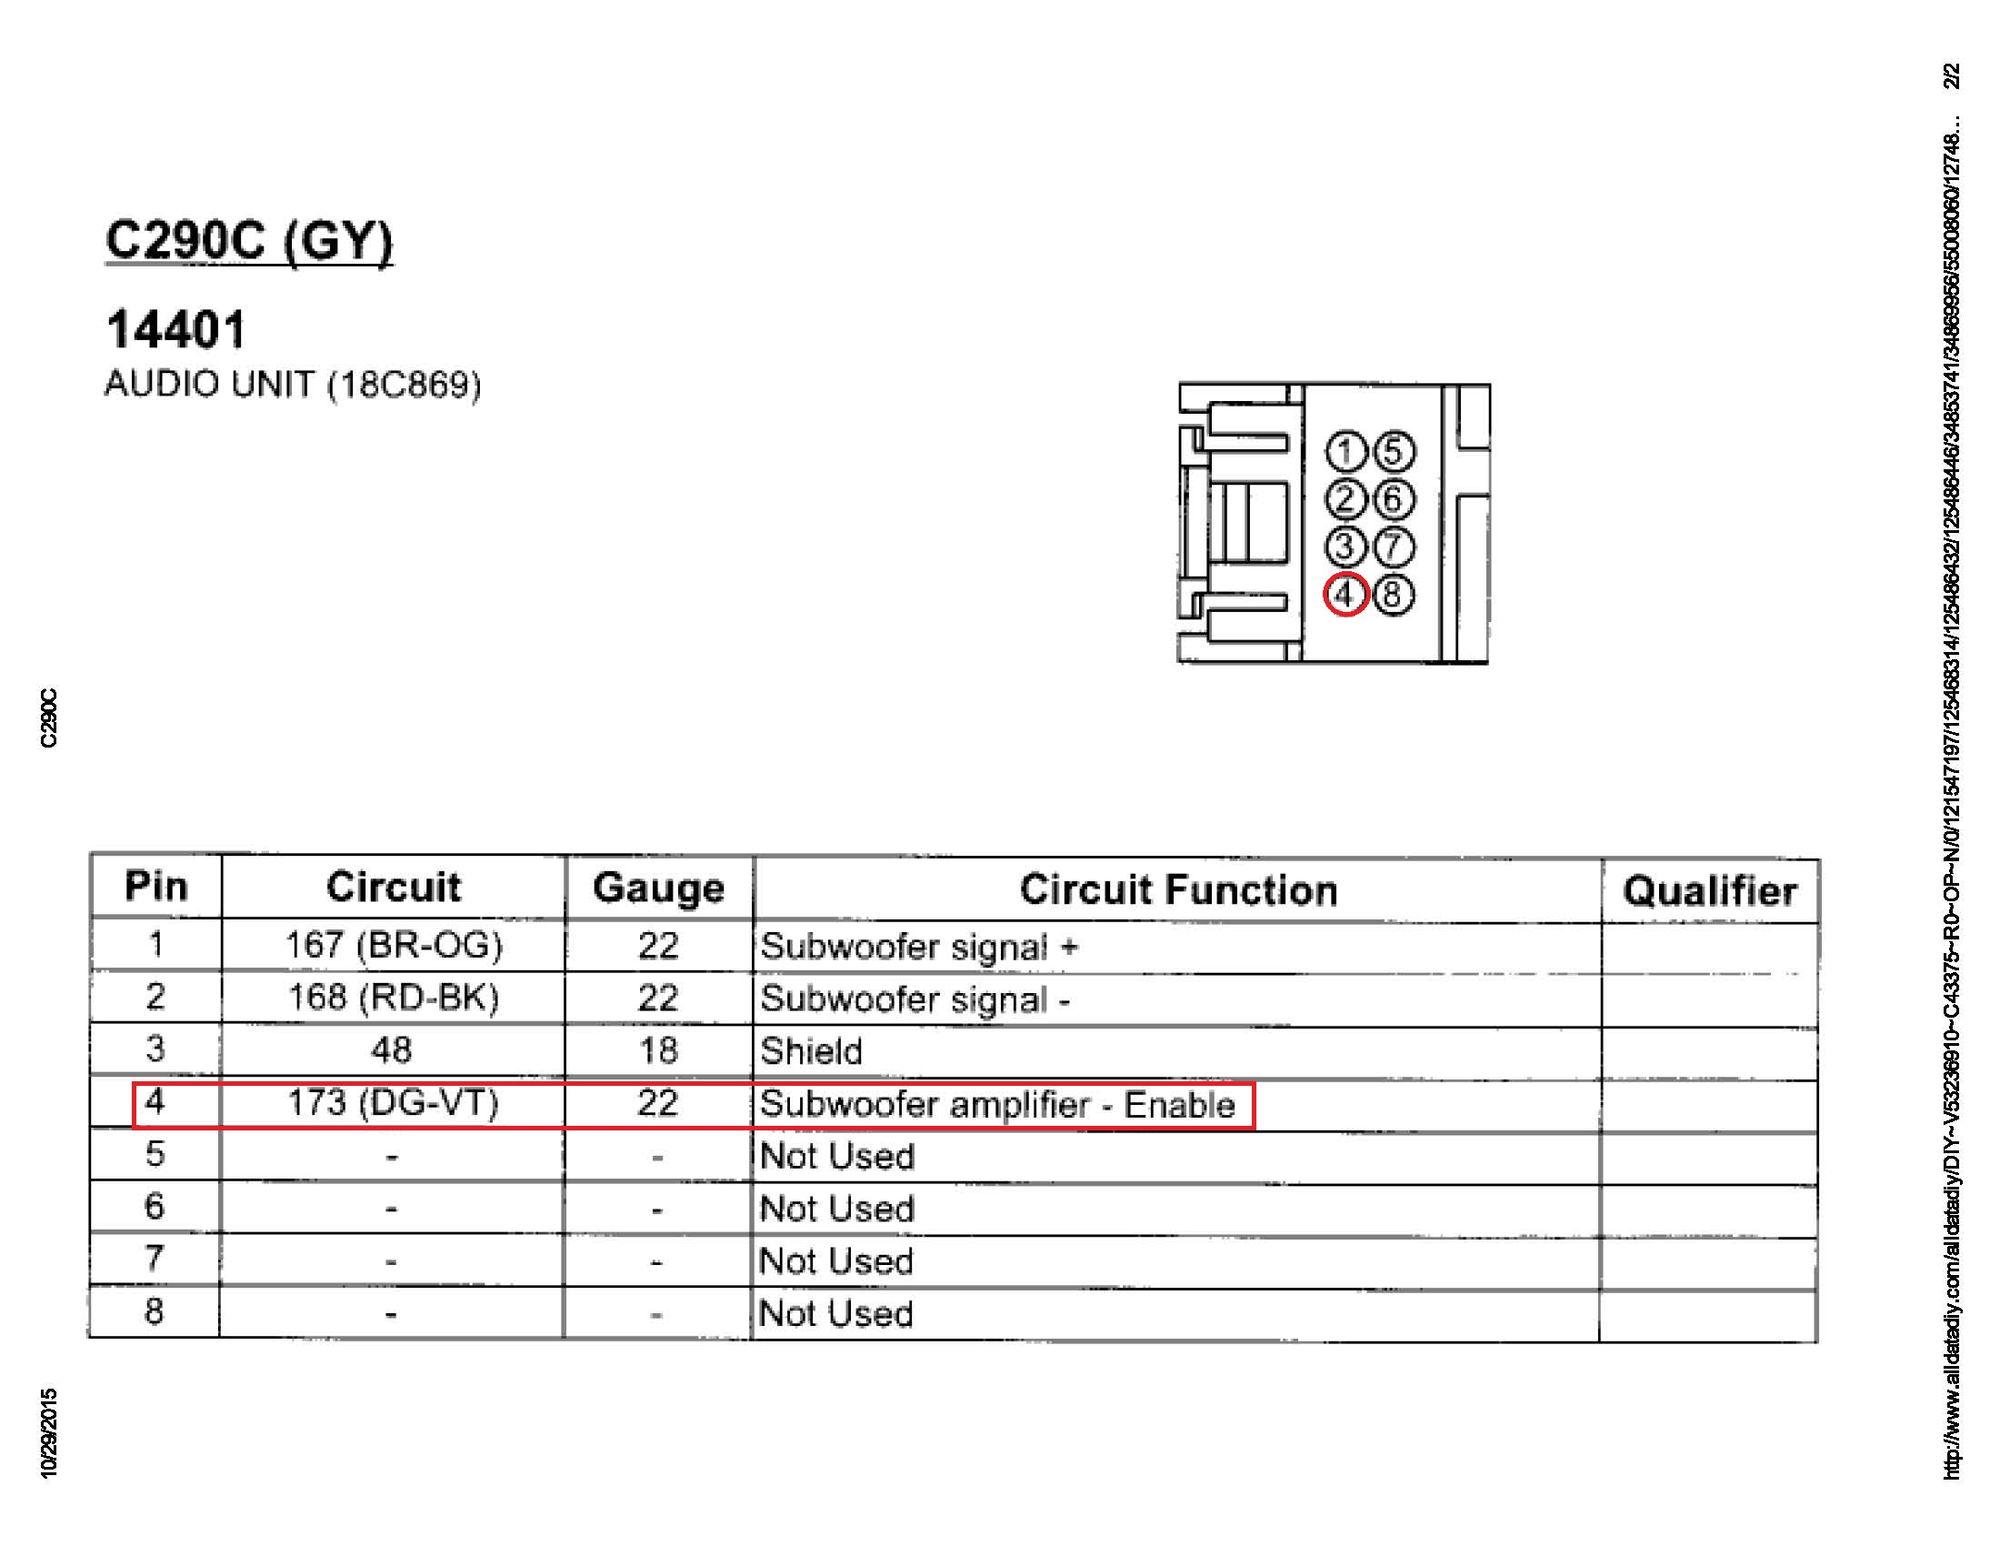 80 c290c_subplghu_d85ed382328ff6386a3184654777ba4d6b199319?resize=665%2C514&ssl=1 metra 70 5521 wiring diagram metra wiring diagrams collection  at bayanpartner.co